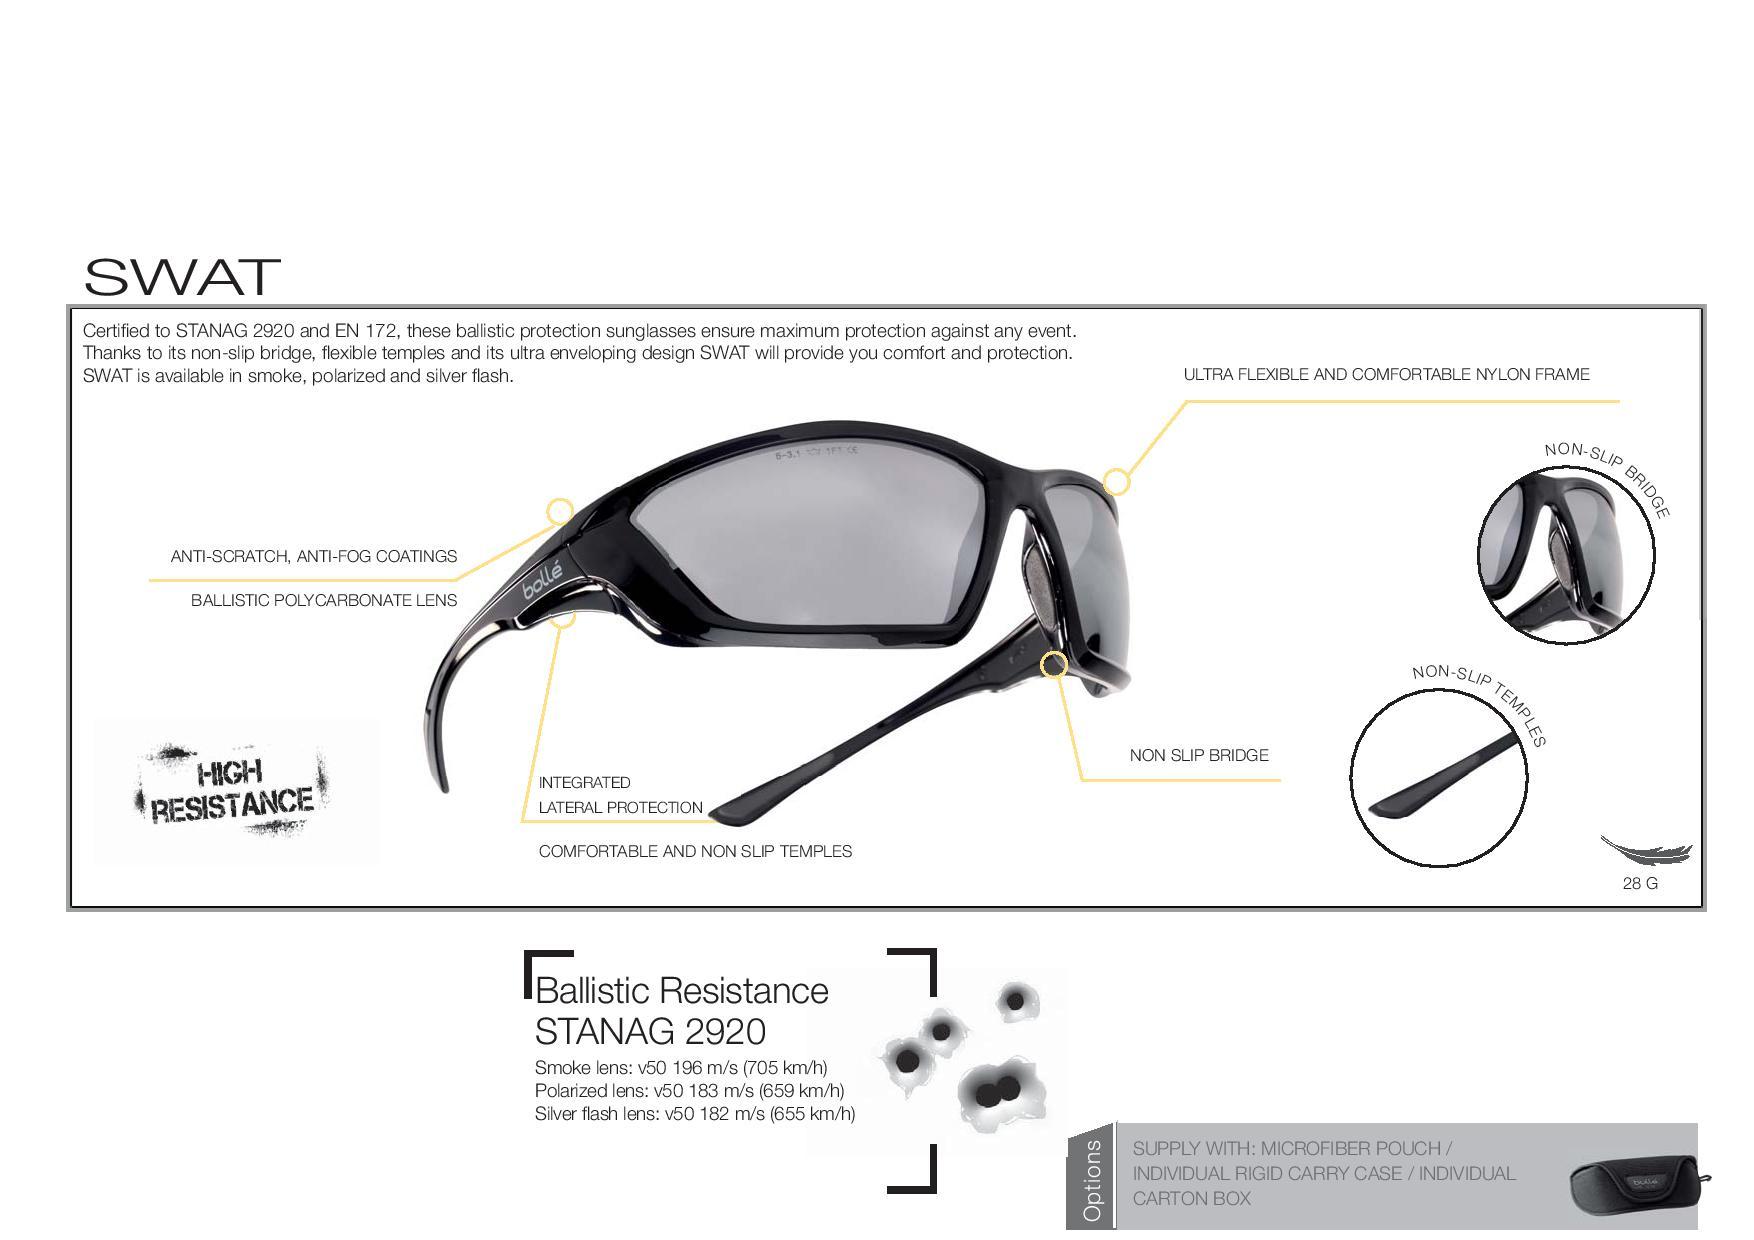 5811fe8db44f7 Bolle Swat Ballistic Sunglasses - Smoke Lense V50 196 m s - Conforms ...